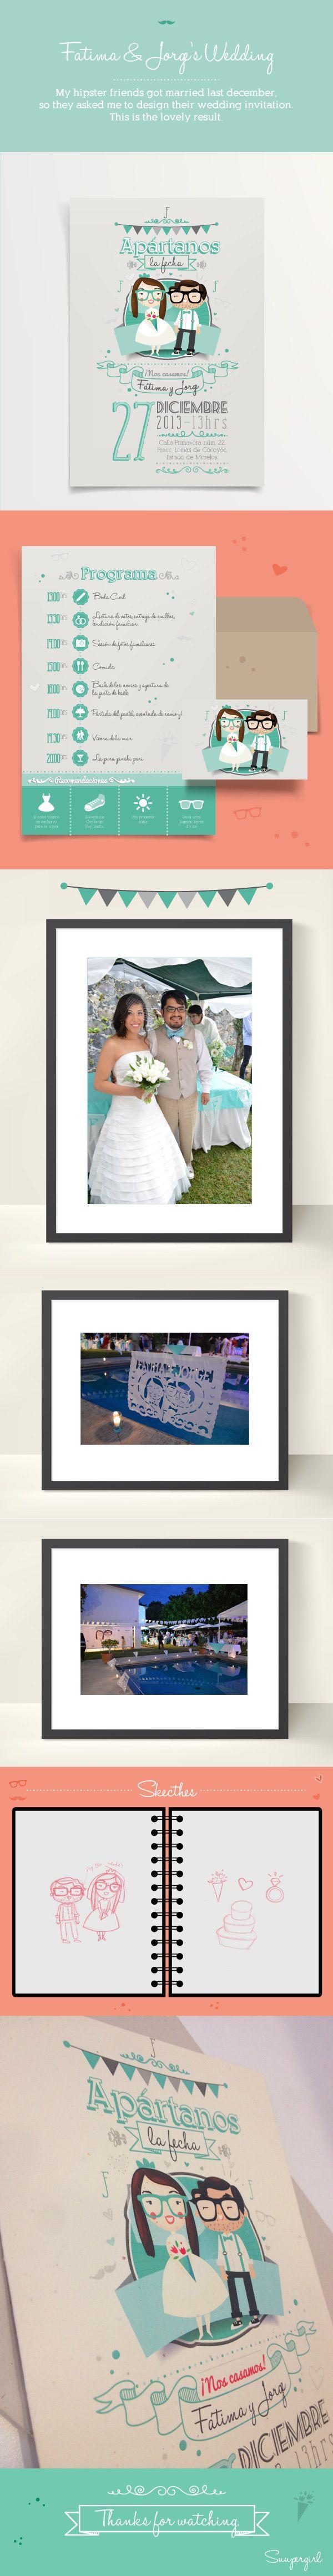 Fatima & Jorge's Wedding Invitation by Suupergirl B., via Behance